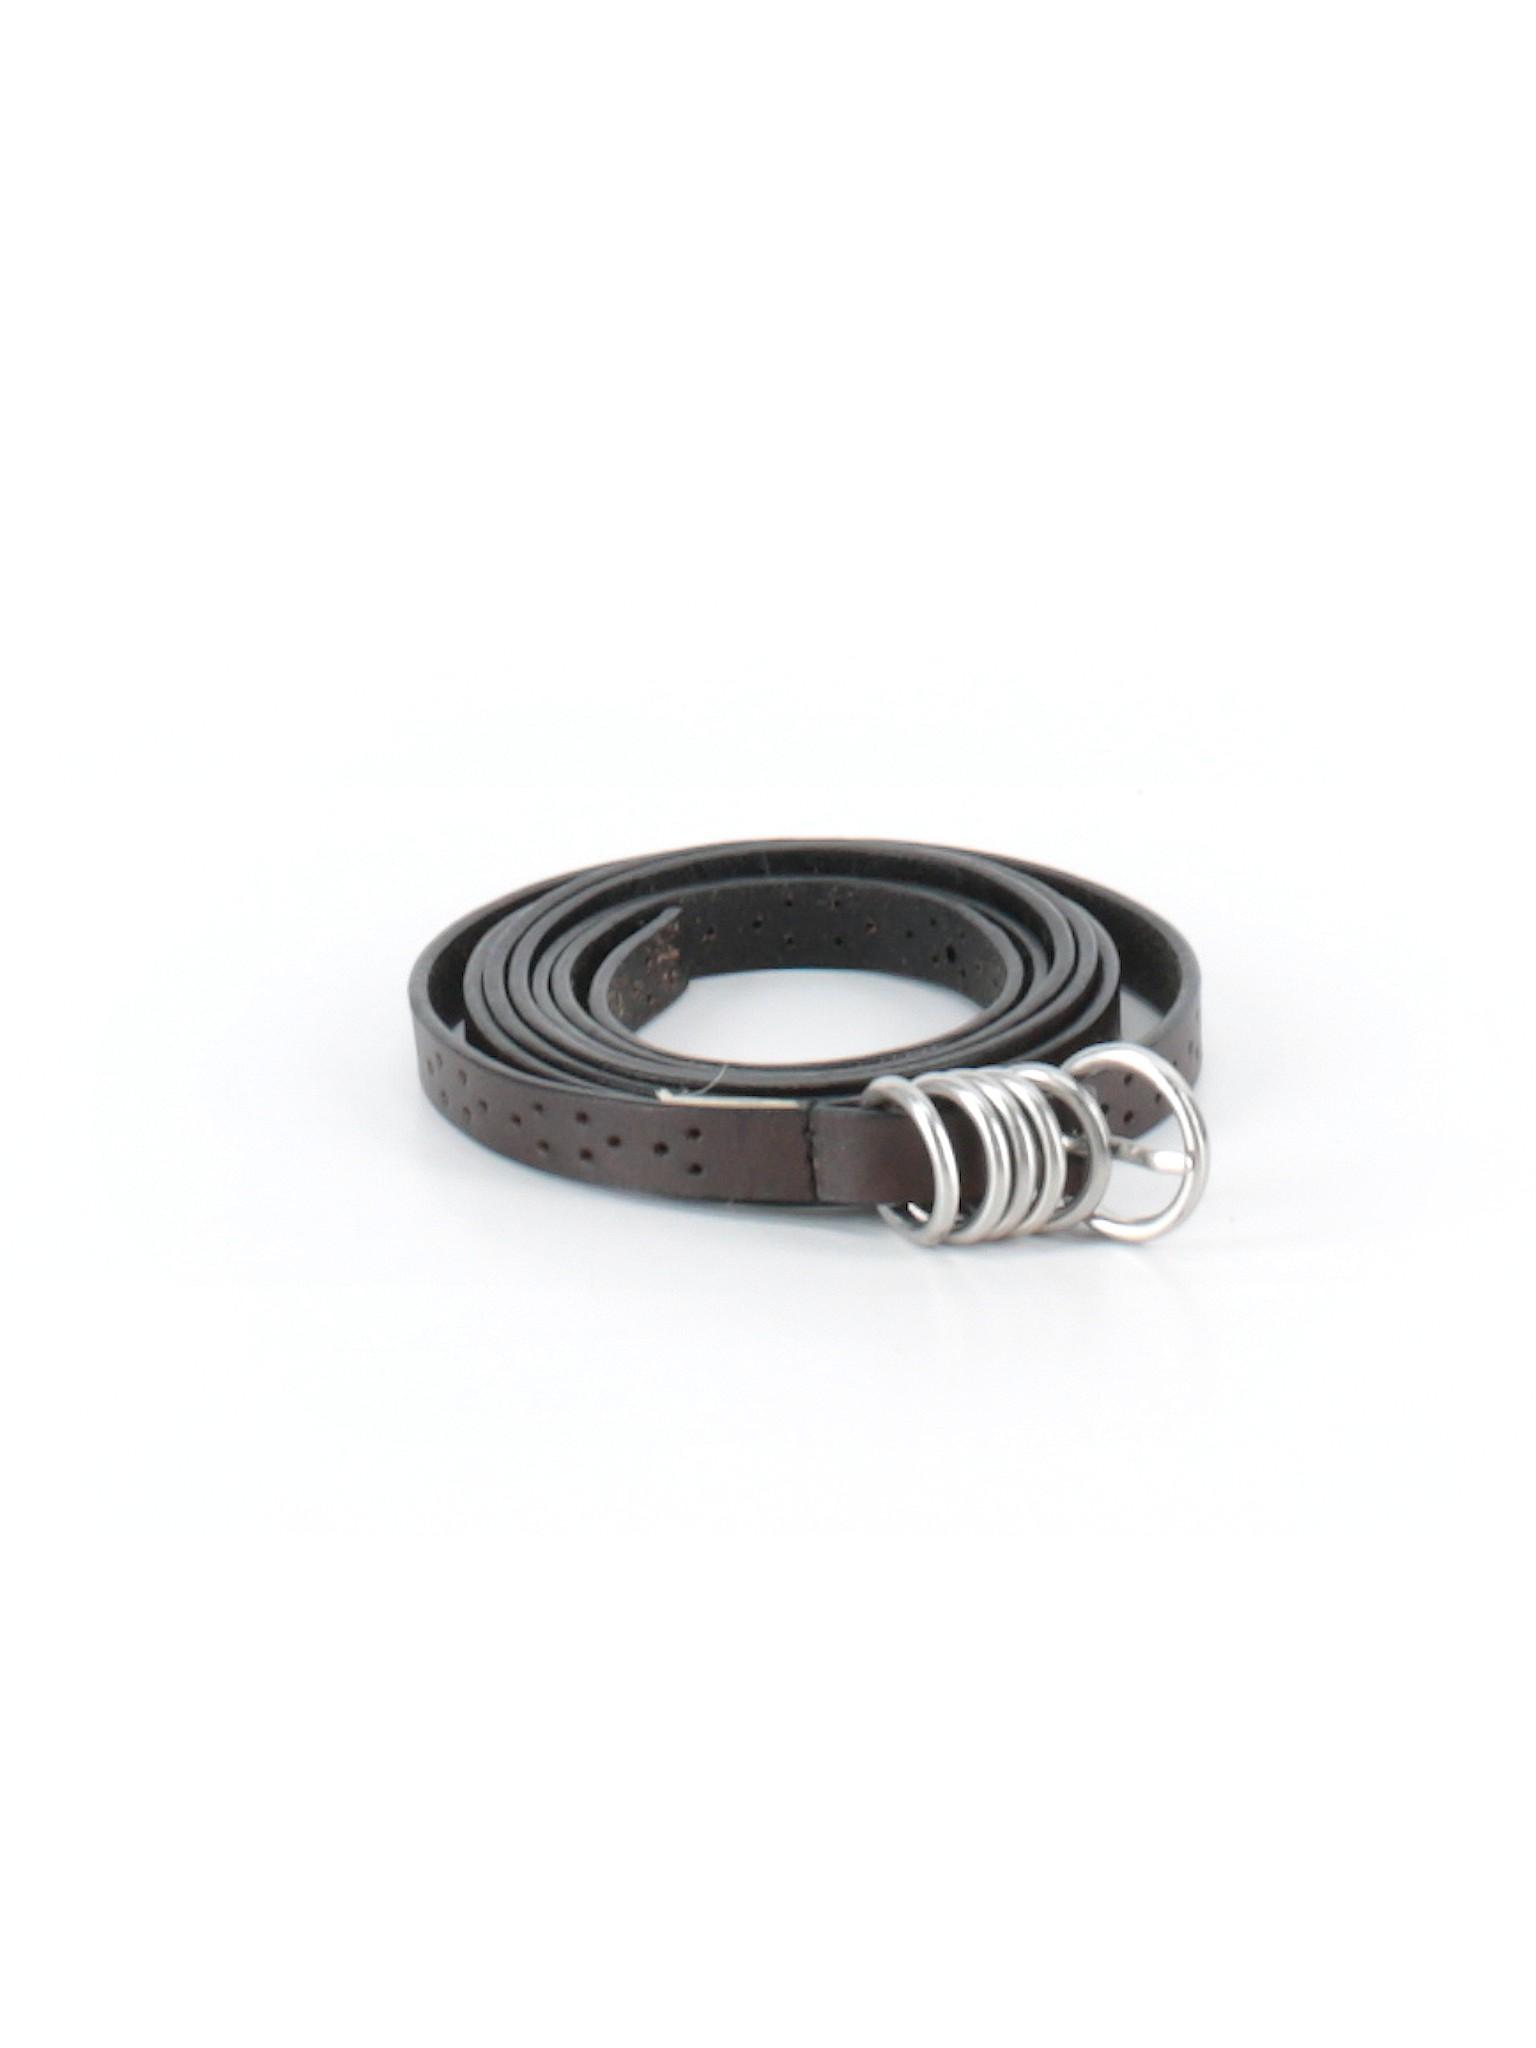 c57b8d0a48 Ann Taylor LOFT 100% Leather Solid Brown Leather Belt Size M - 72 ...